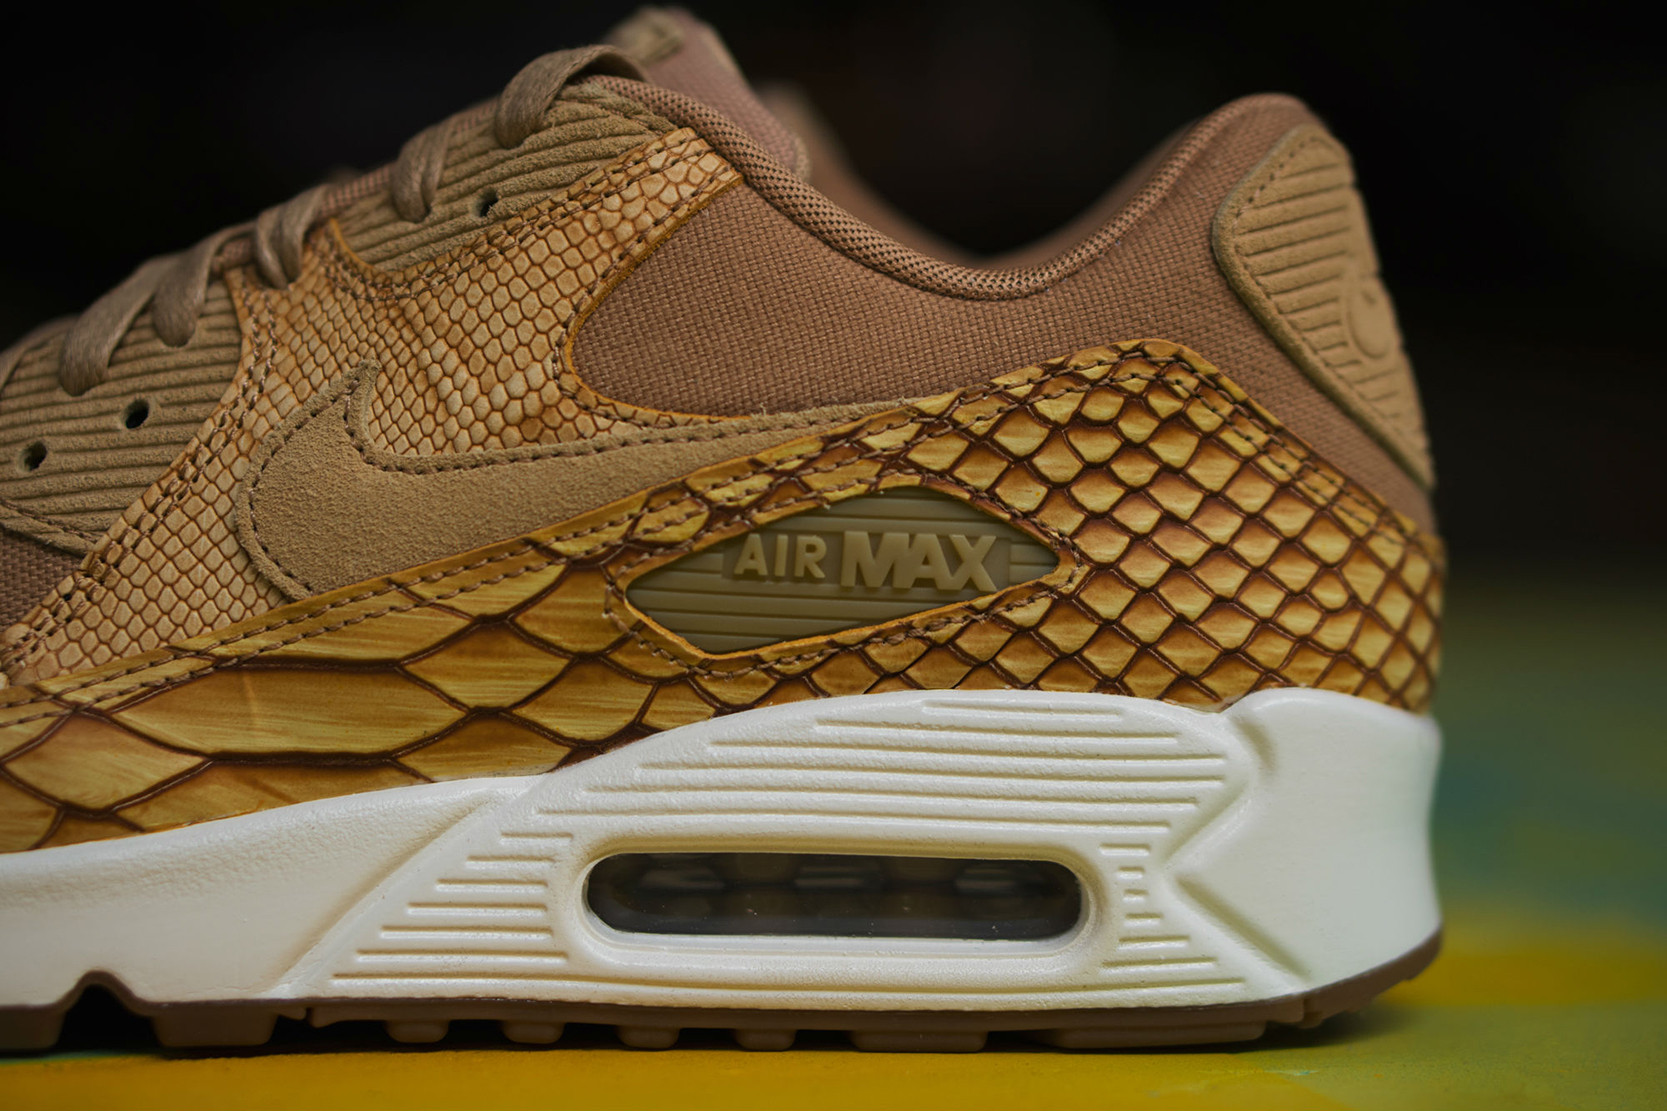 Nike Air Max 90 Premium Reptile Leather